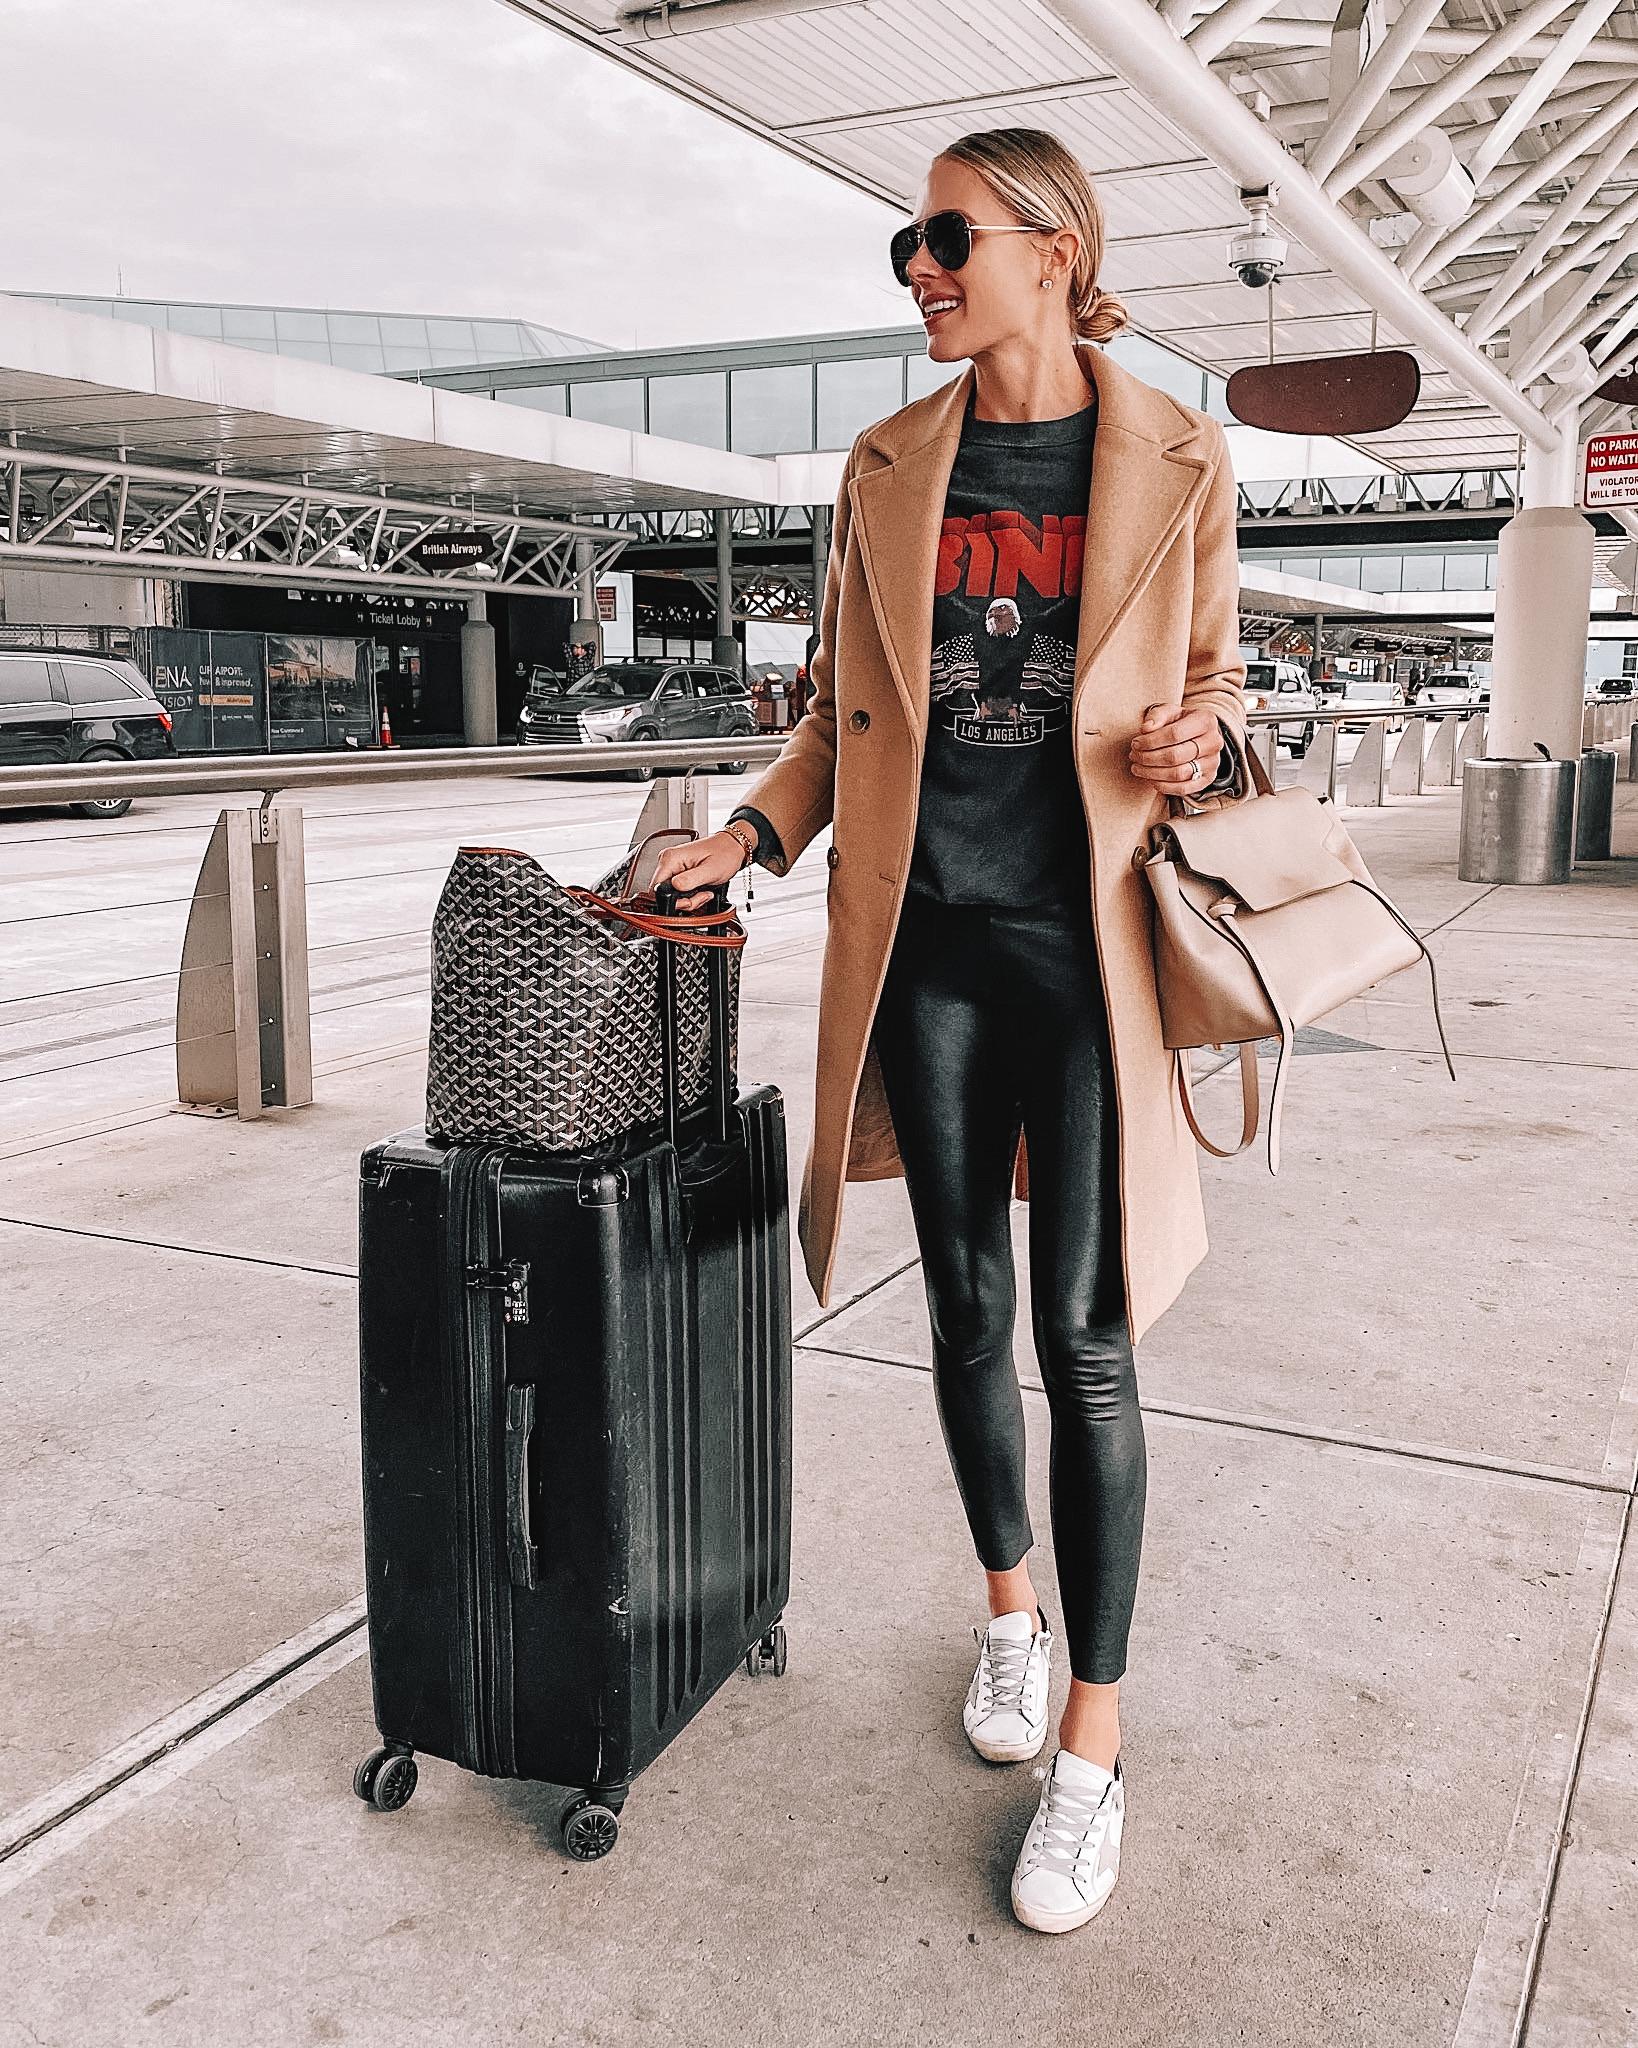 Fashion Jackson Wearing Camel Coat Anine Bing Sweatshirt Spanx Faux Leather Leggings Golden Goose Sneakers Calpak Luggage Airport Style Travel Outfit